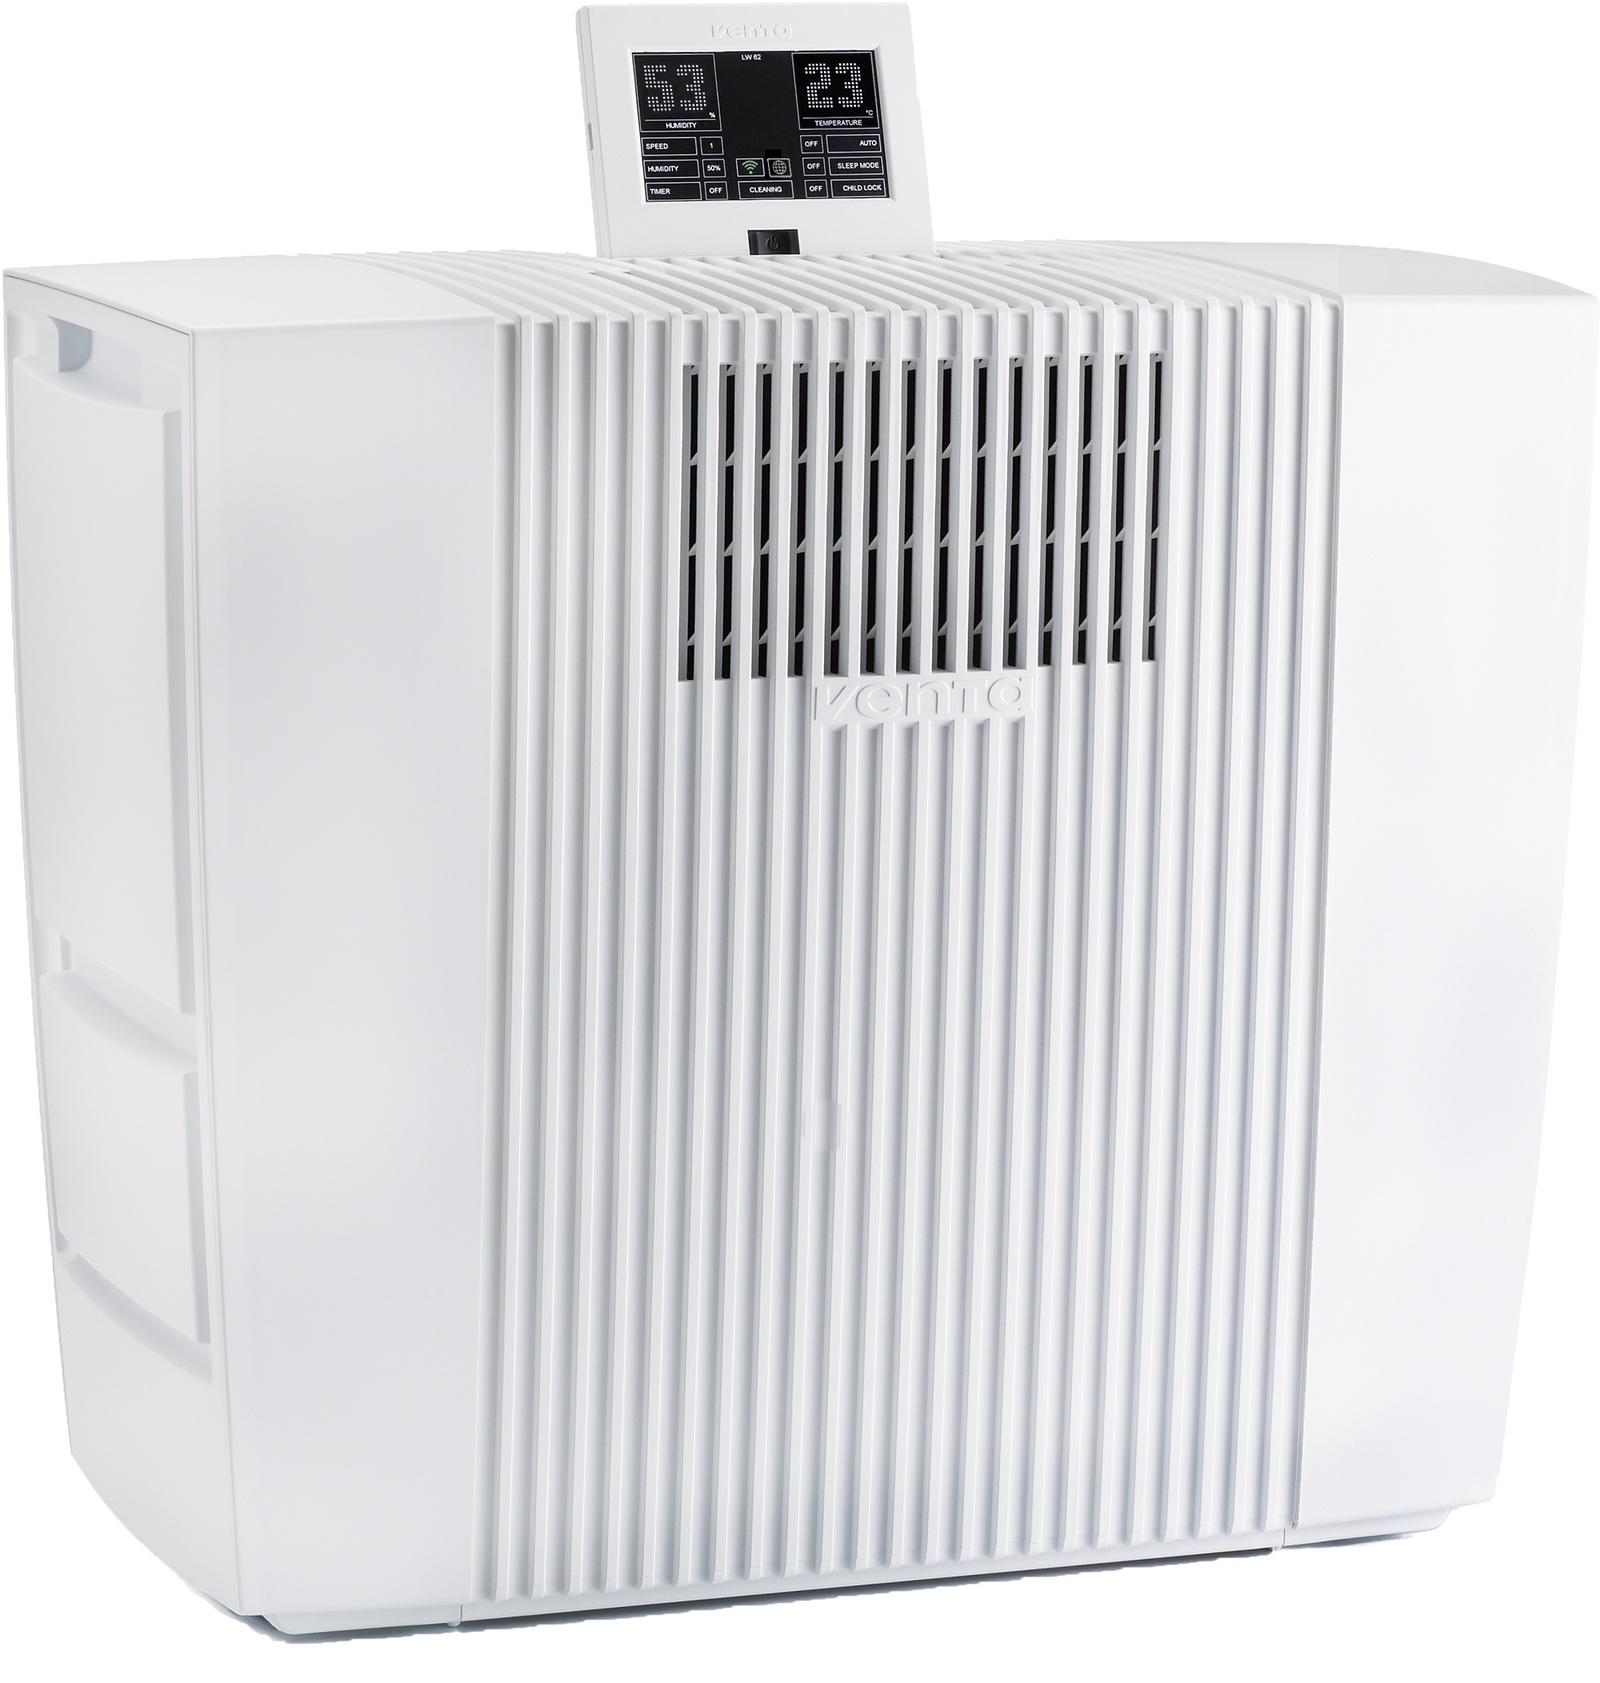 Мойка воздуха Venta Venta black/white, LW62 WiFi weiss цена